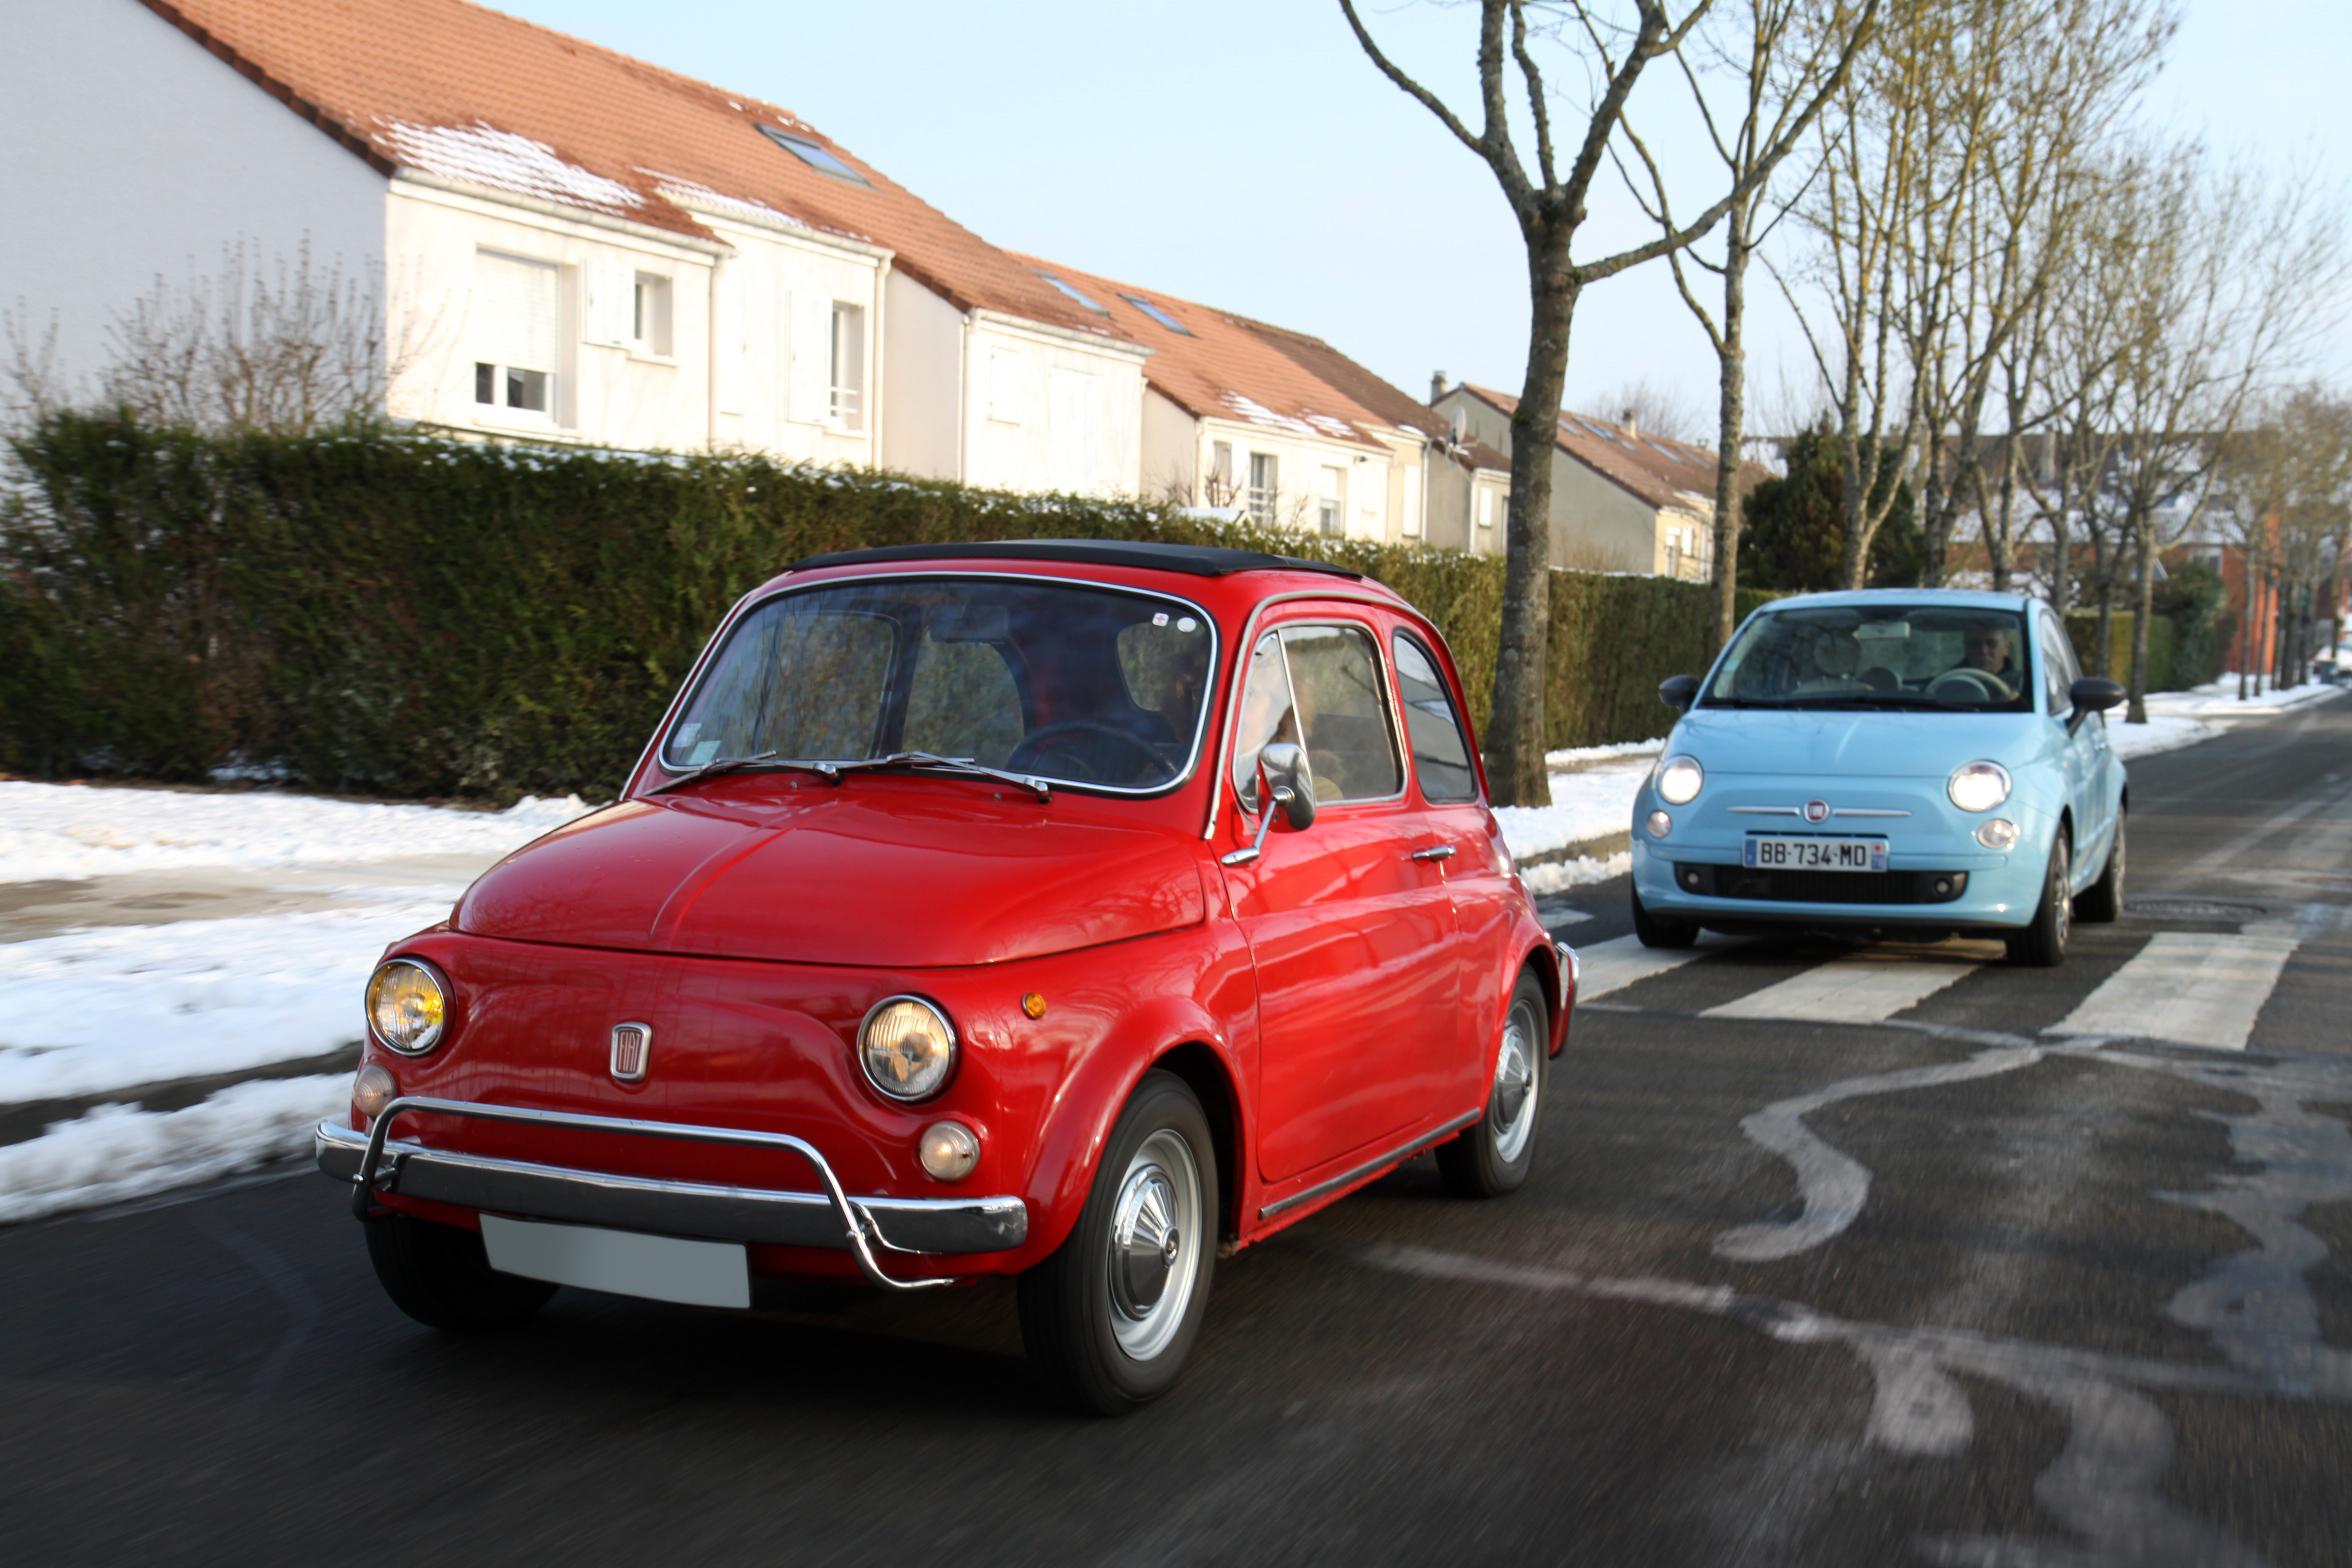 Vid o fiat 500 luxe 1970 vs fiat 500 twinair 2008 for Garage peugeot montigny les cormeilles